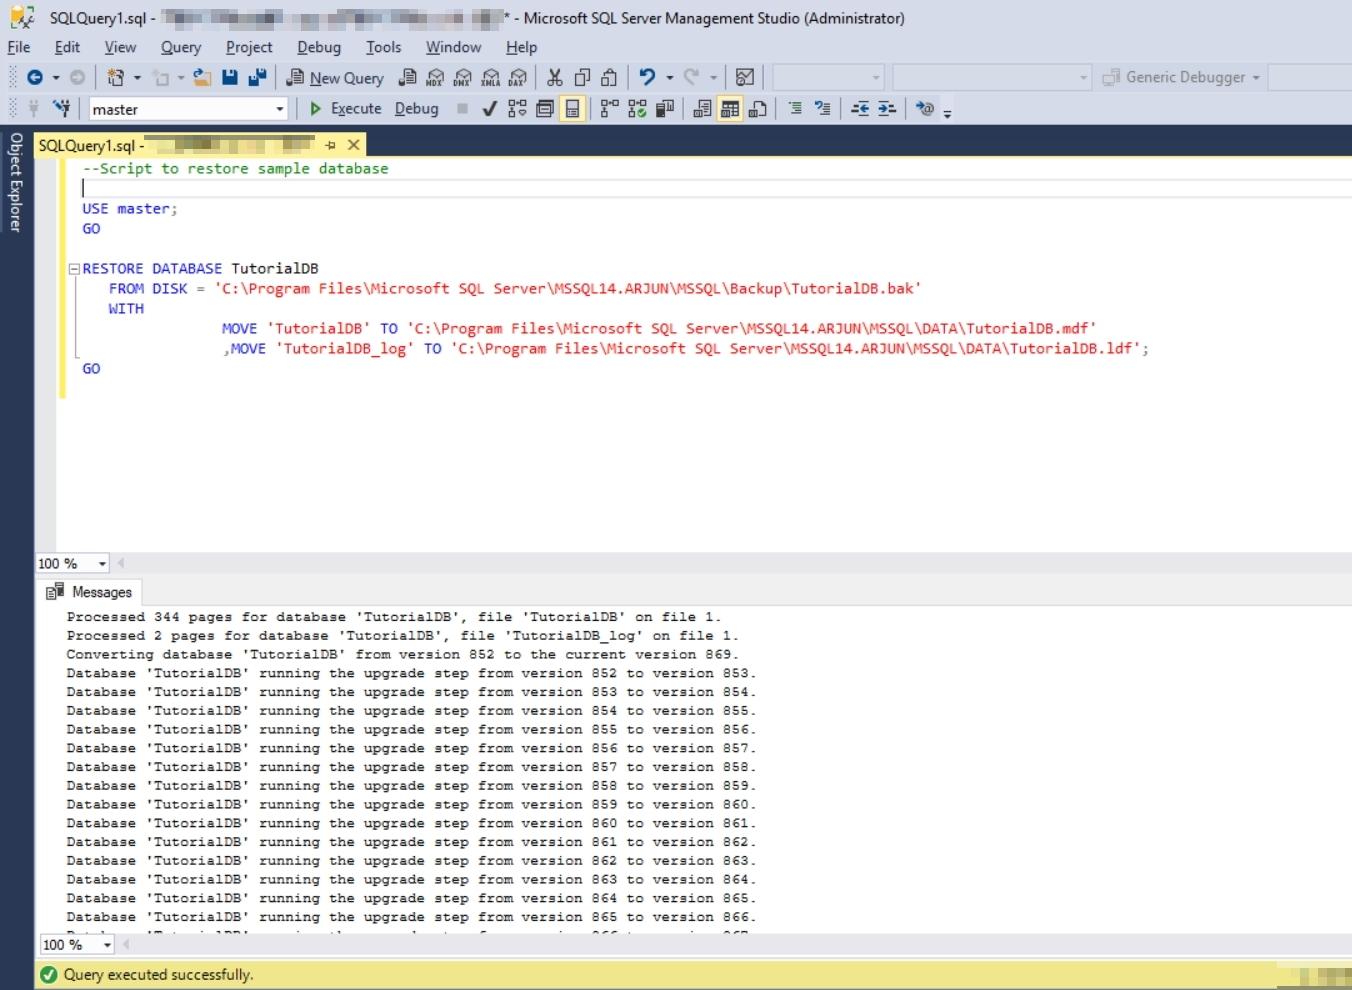 002_RestoreSampleDatabase-TutorialDB